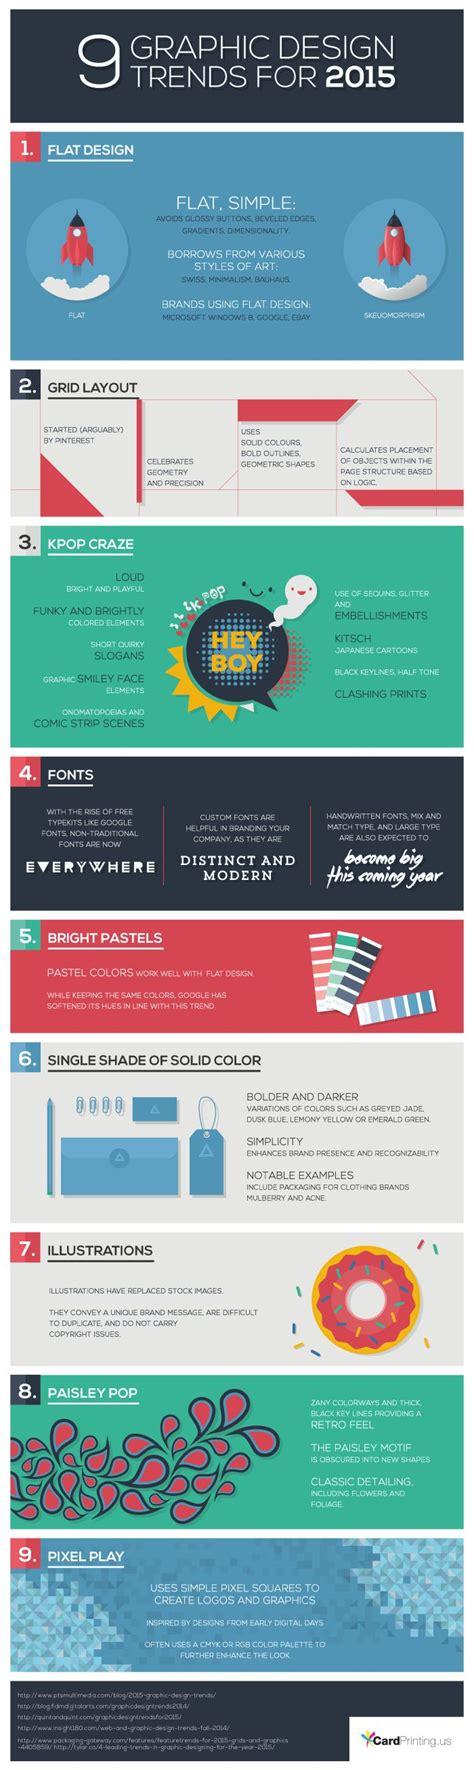 visual design management geneva 16 best infographies images on pinterest organization